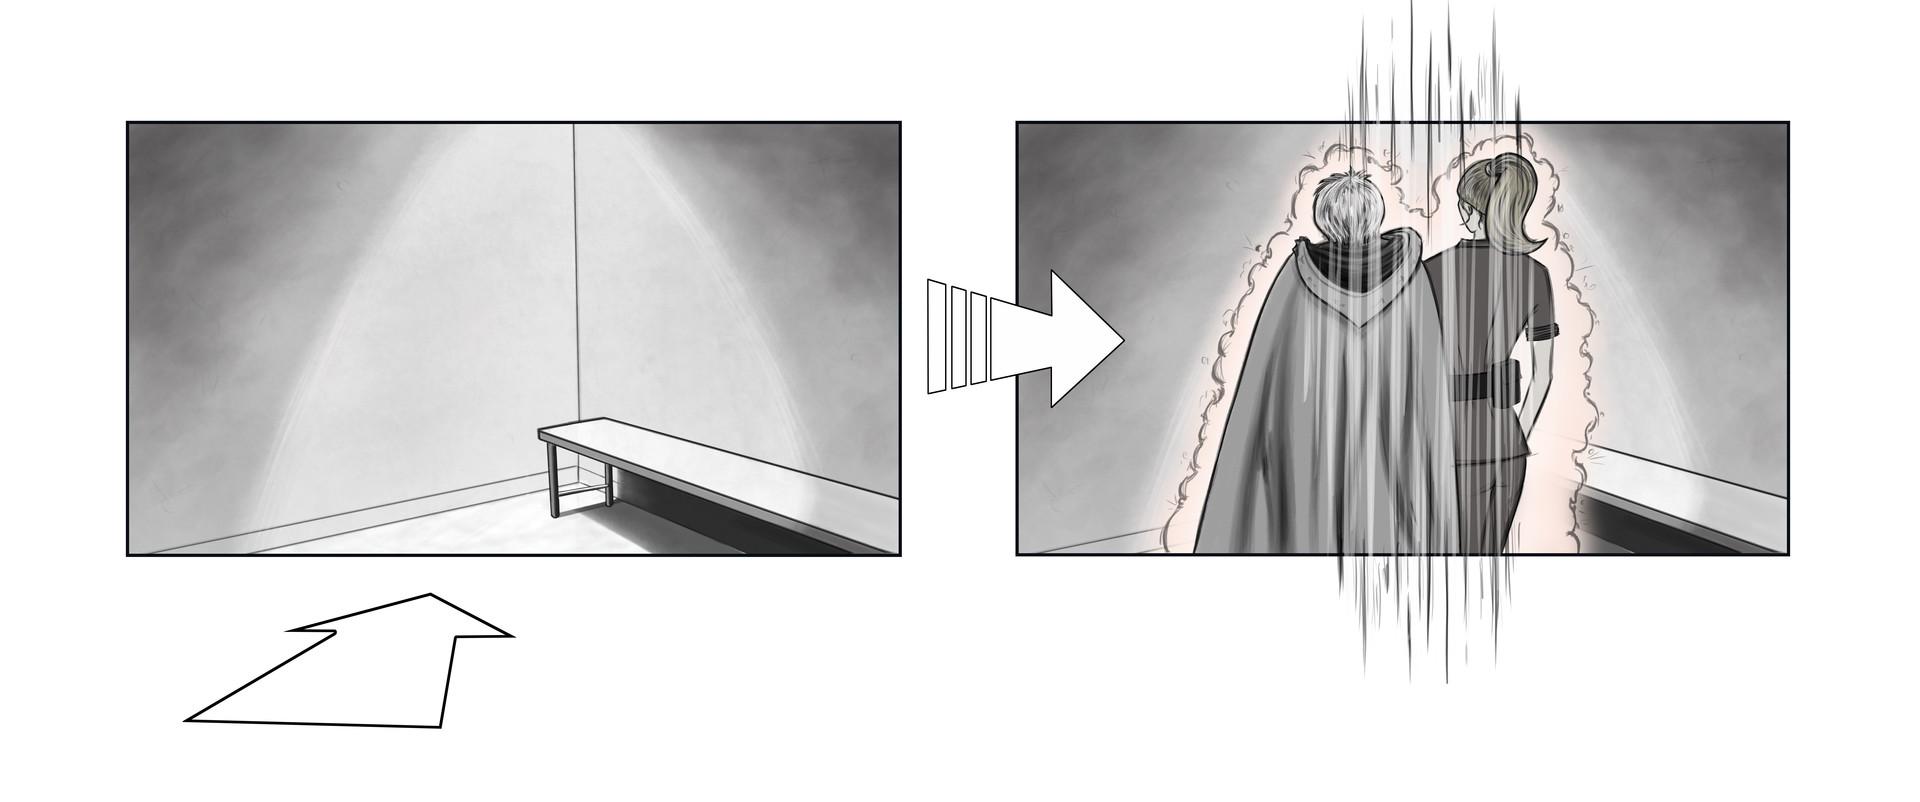 Dwayne stacho wos storyboard panel 01